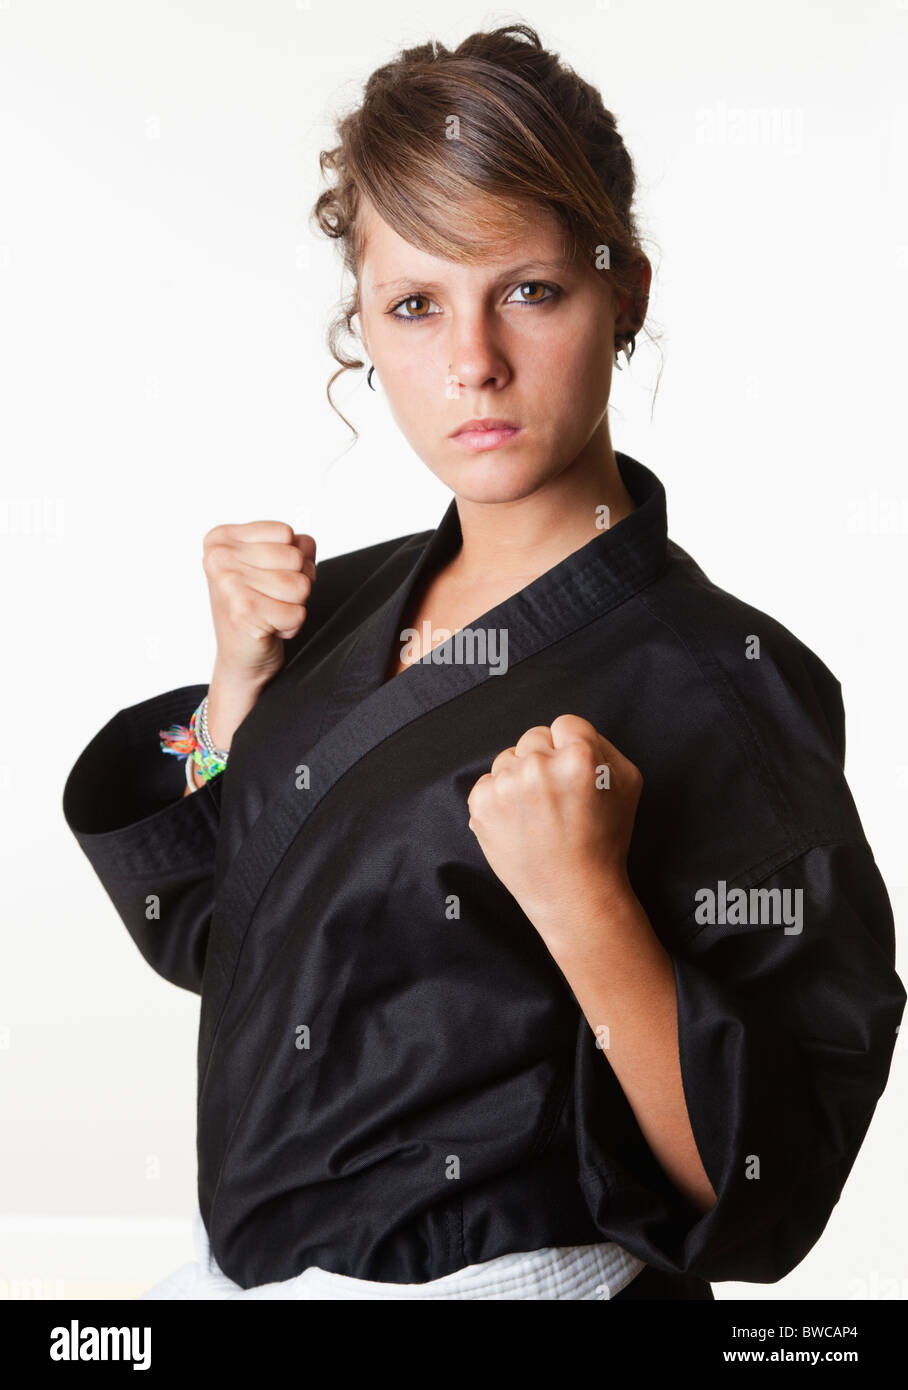 USA, California, Fairfax, Portrait of teen girl (14-15) wearing gi - Stock Image